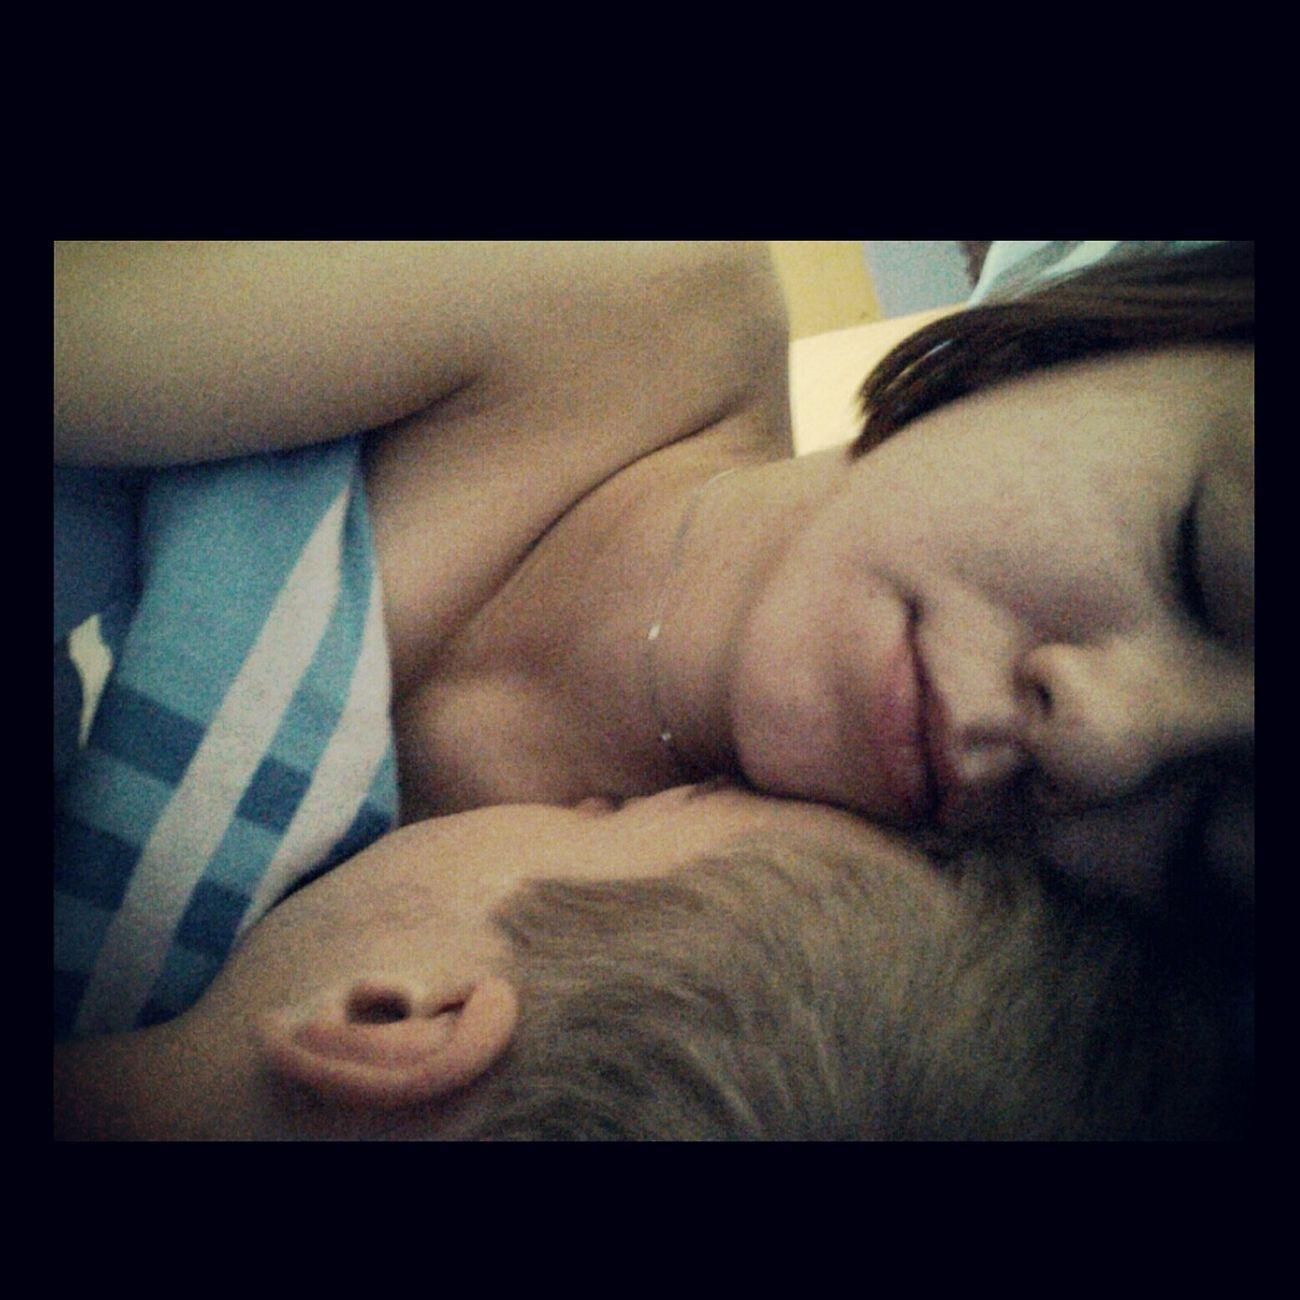 Cutecouple Relaxing MyLove❤ SweetNight Baby?